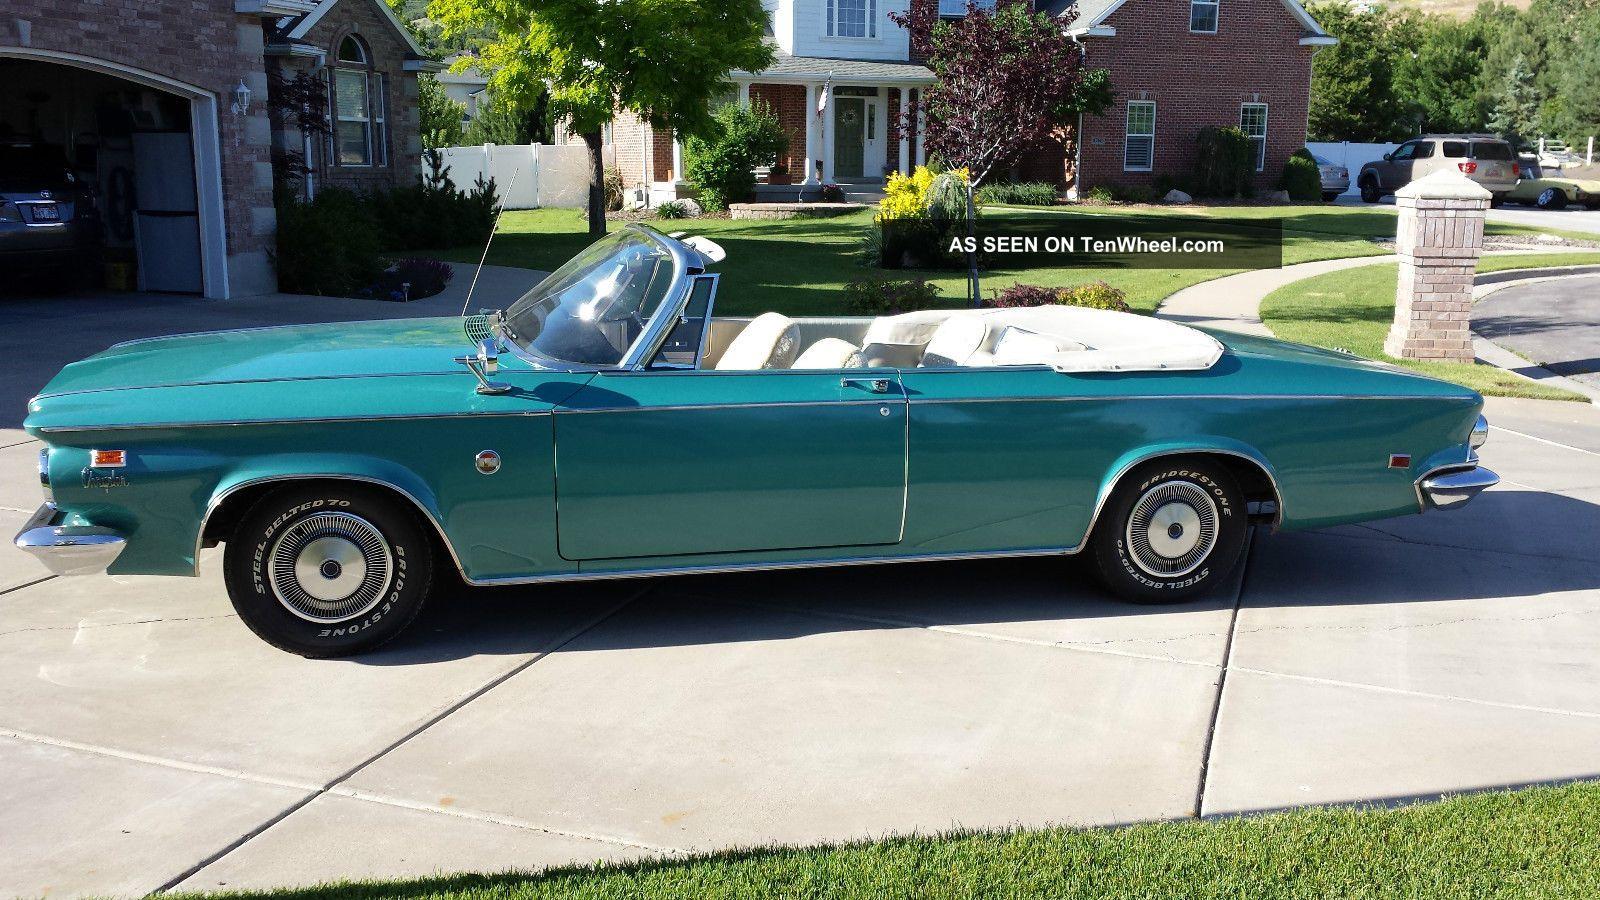 1963 Chrysler 300 300 Series photo